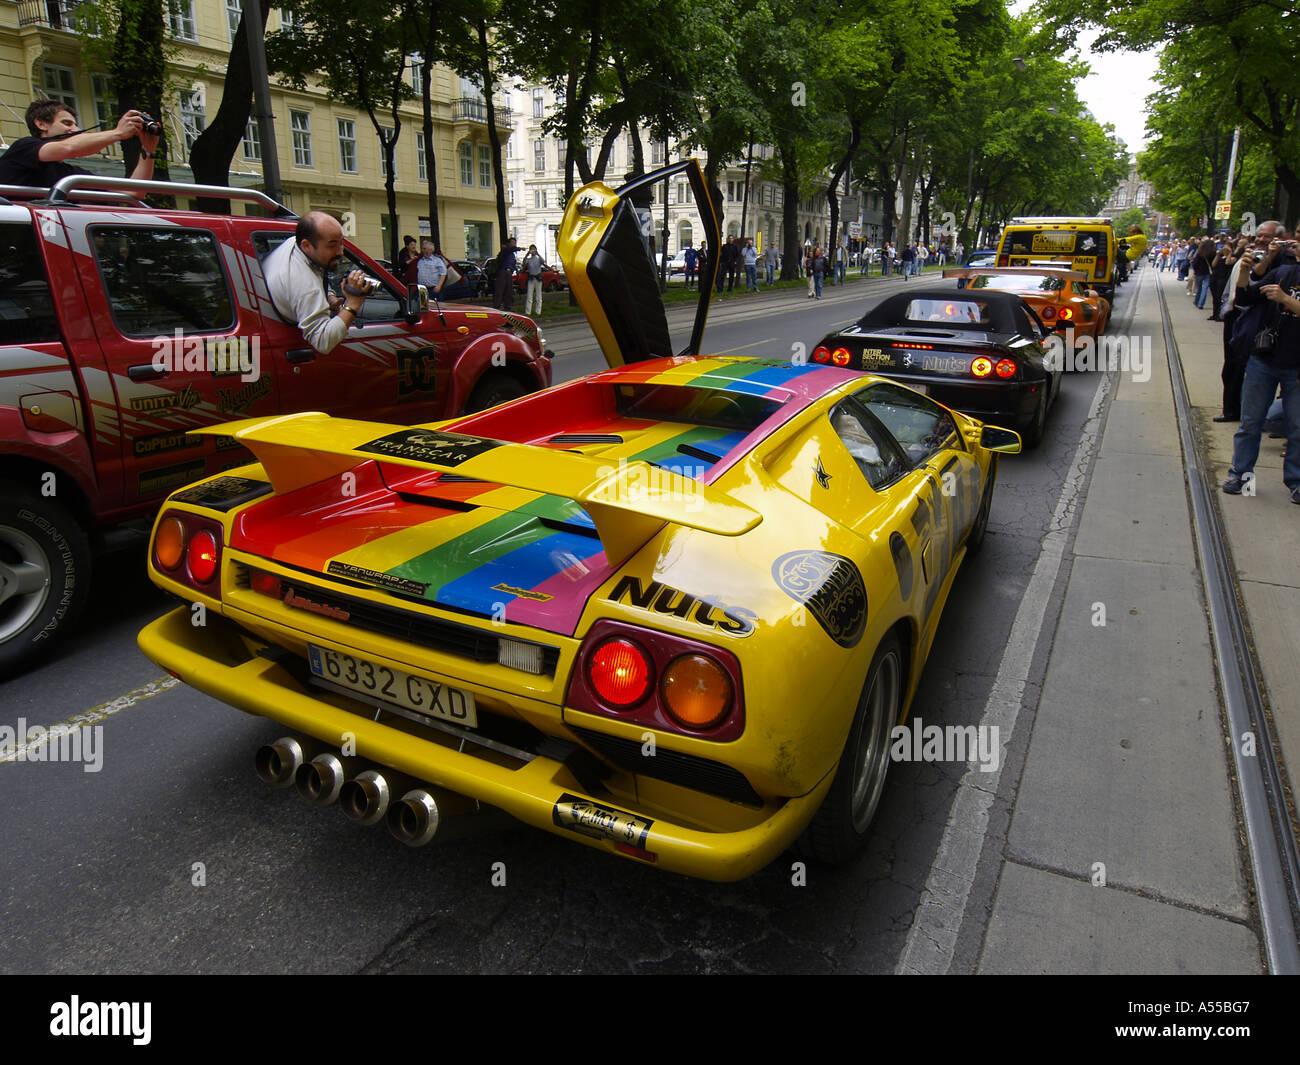 Gumball 3000 Illegal Street Rallye Colourful Racing Cars